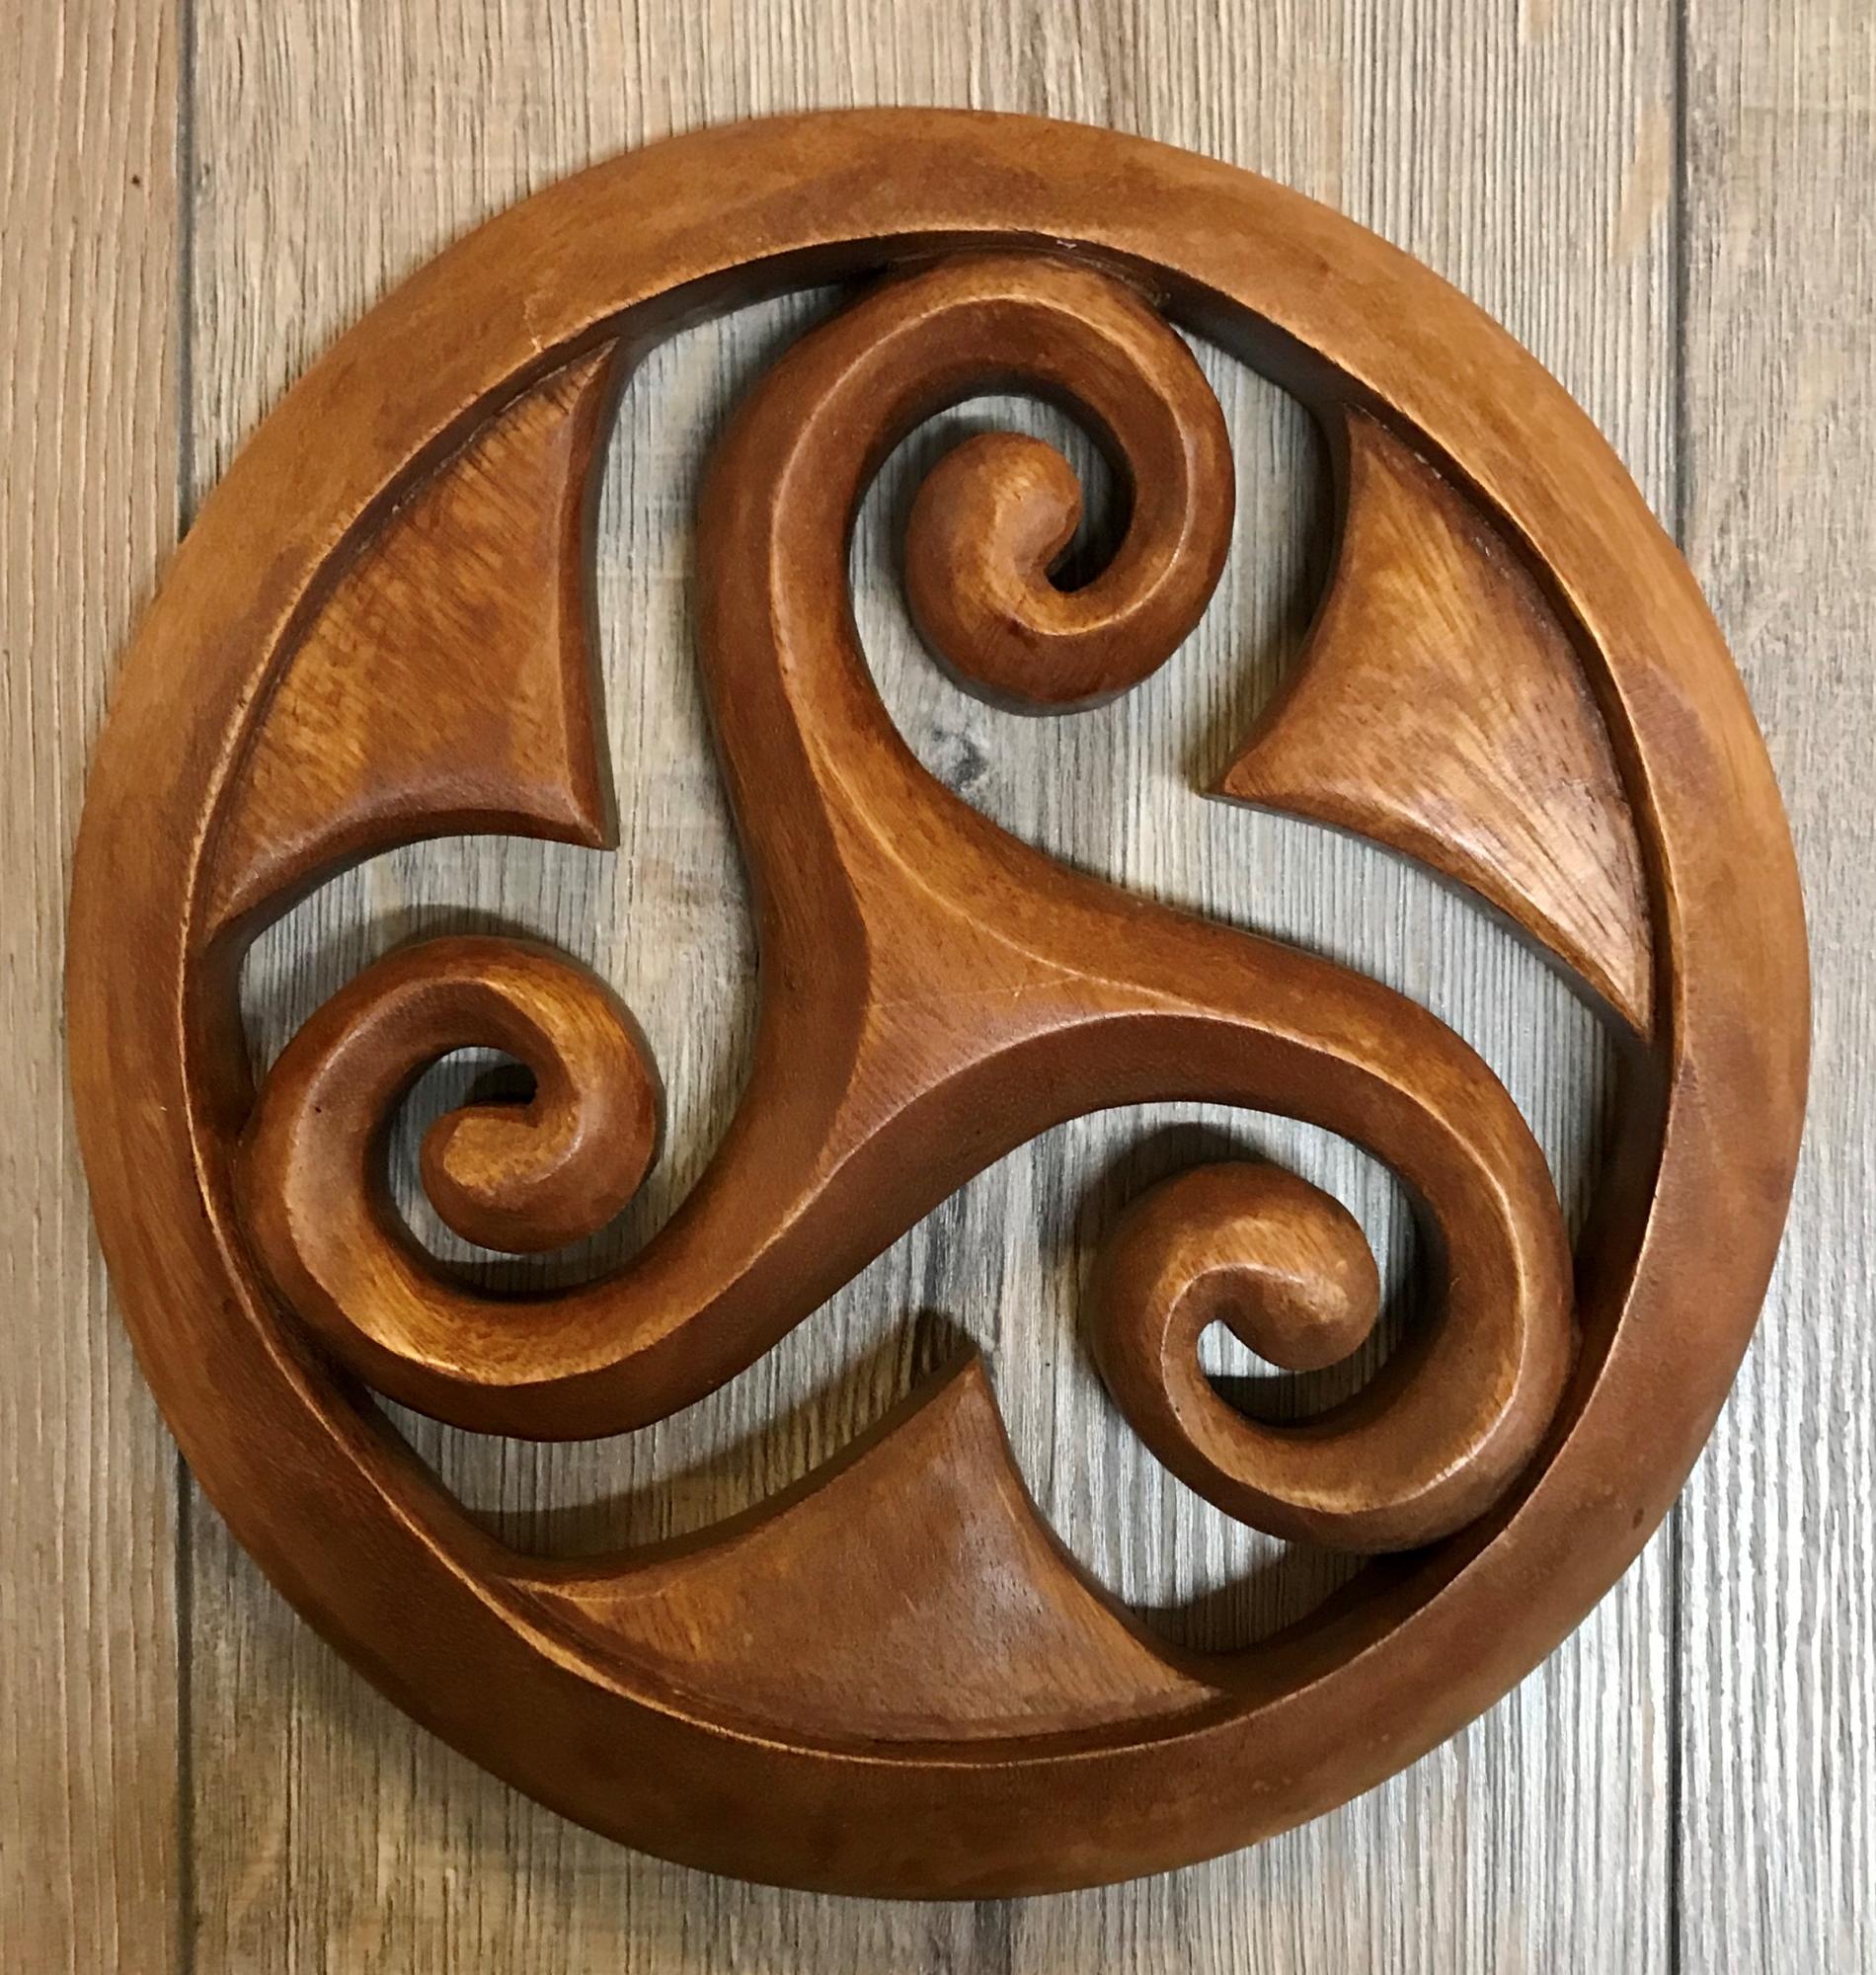 Symbole keltisch